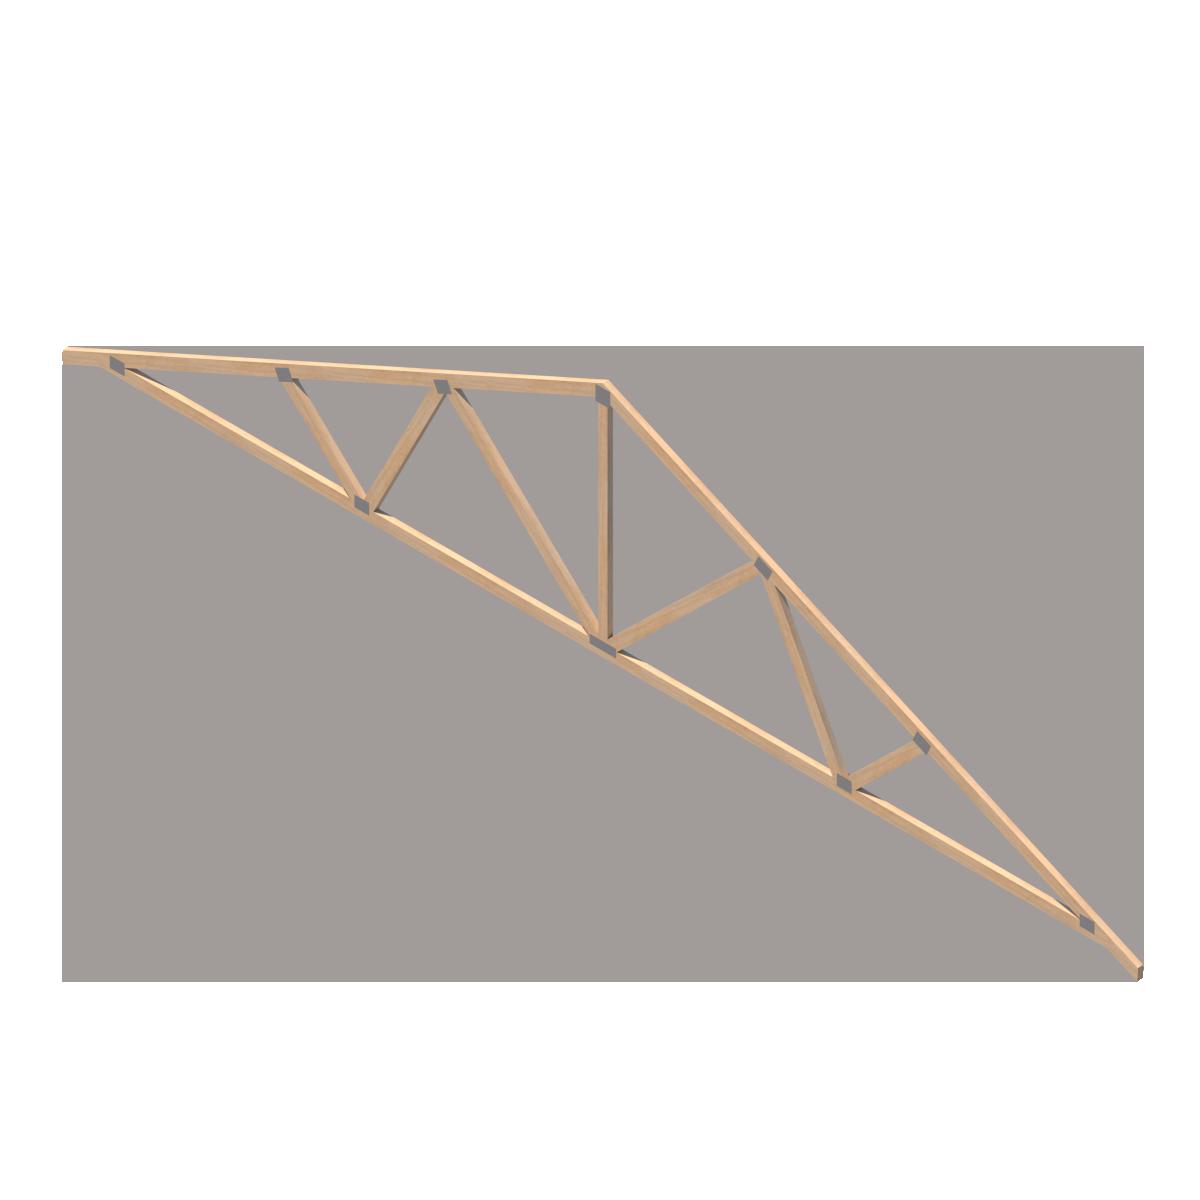 Cercha Prefabricada de Madera de Tecnopanel en BIM